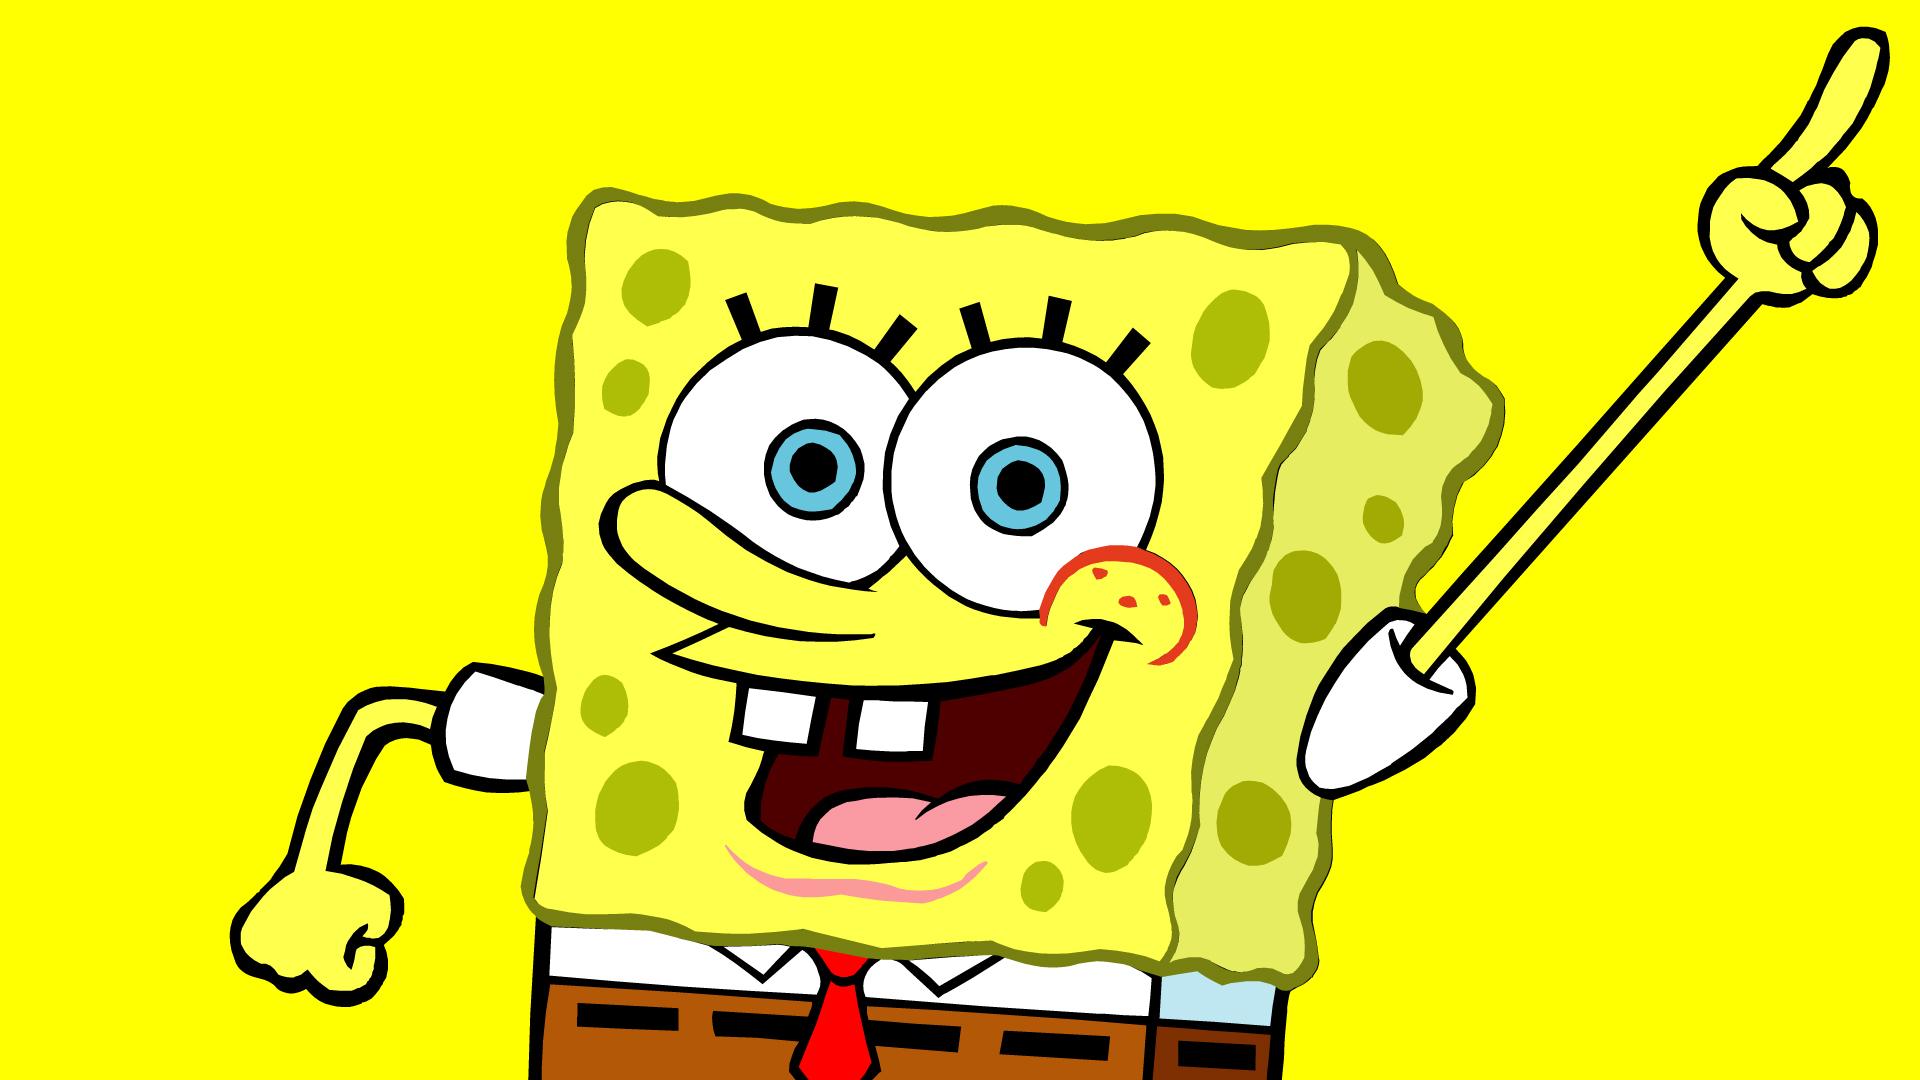 Spongebob Wallpapers High Quality